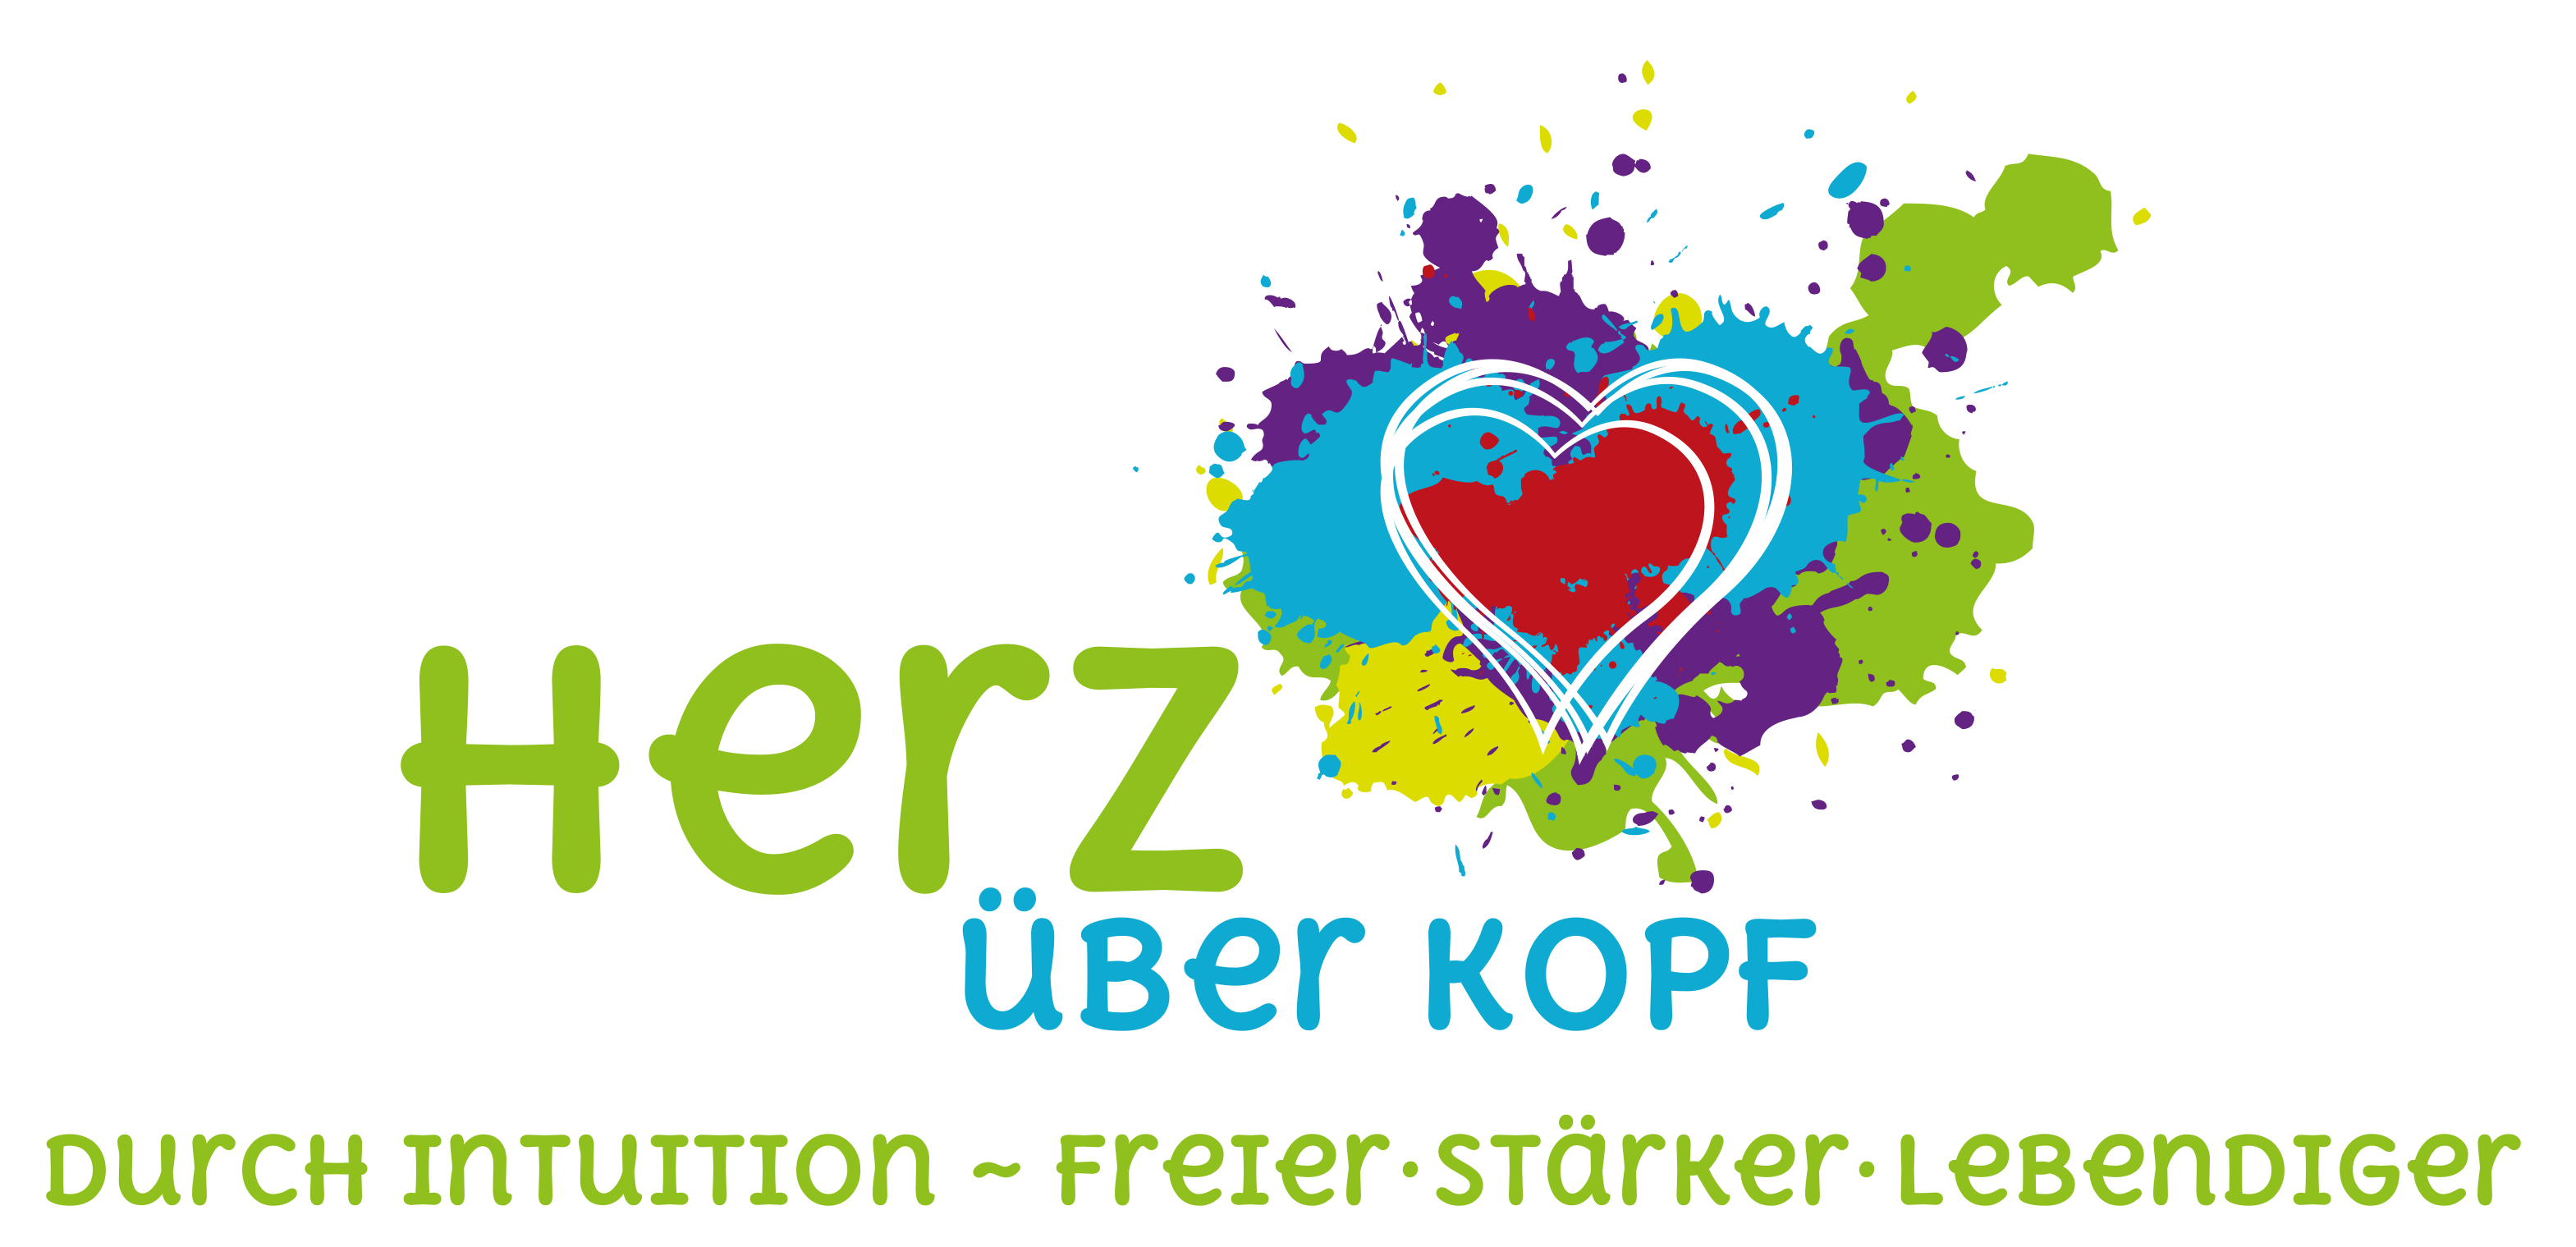 herz_ueber_kopf_schriftzug_large